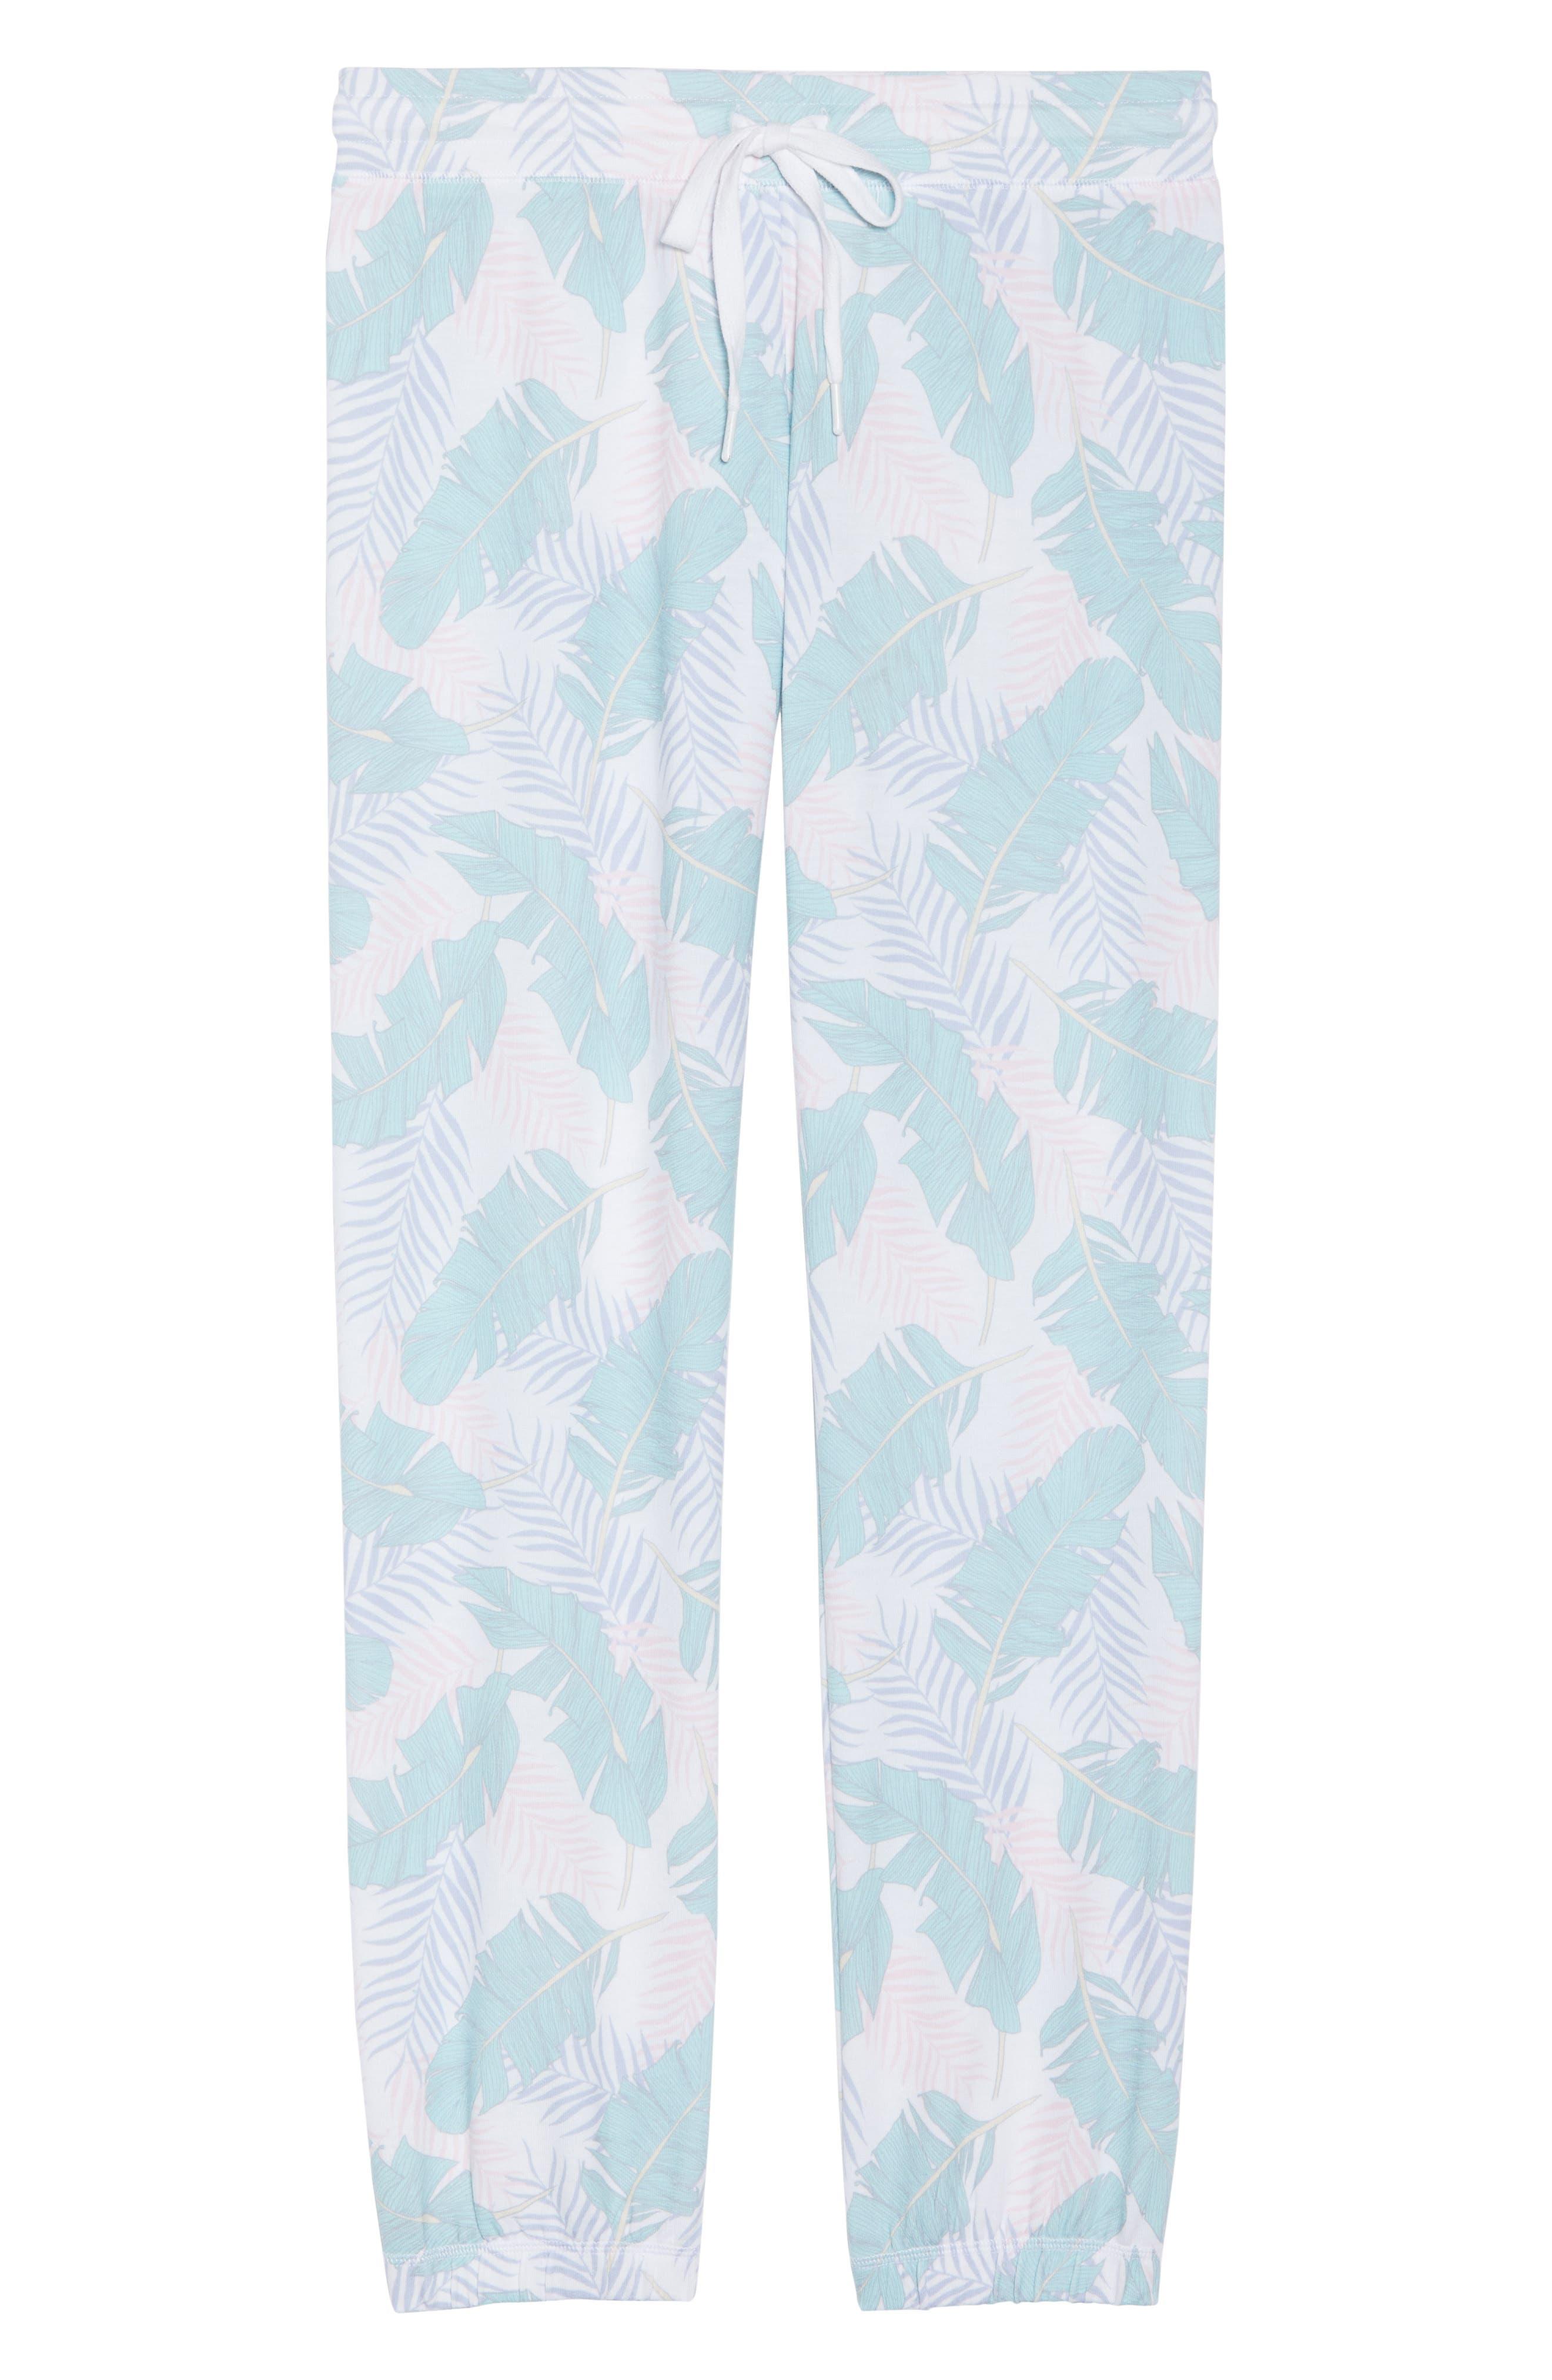 Peachy Jogger Lounge Pants,                             Alternate thumbnail 6, color,                             100